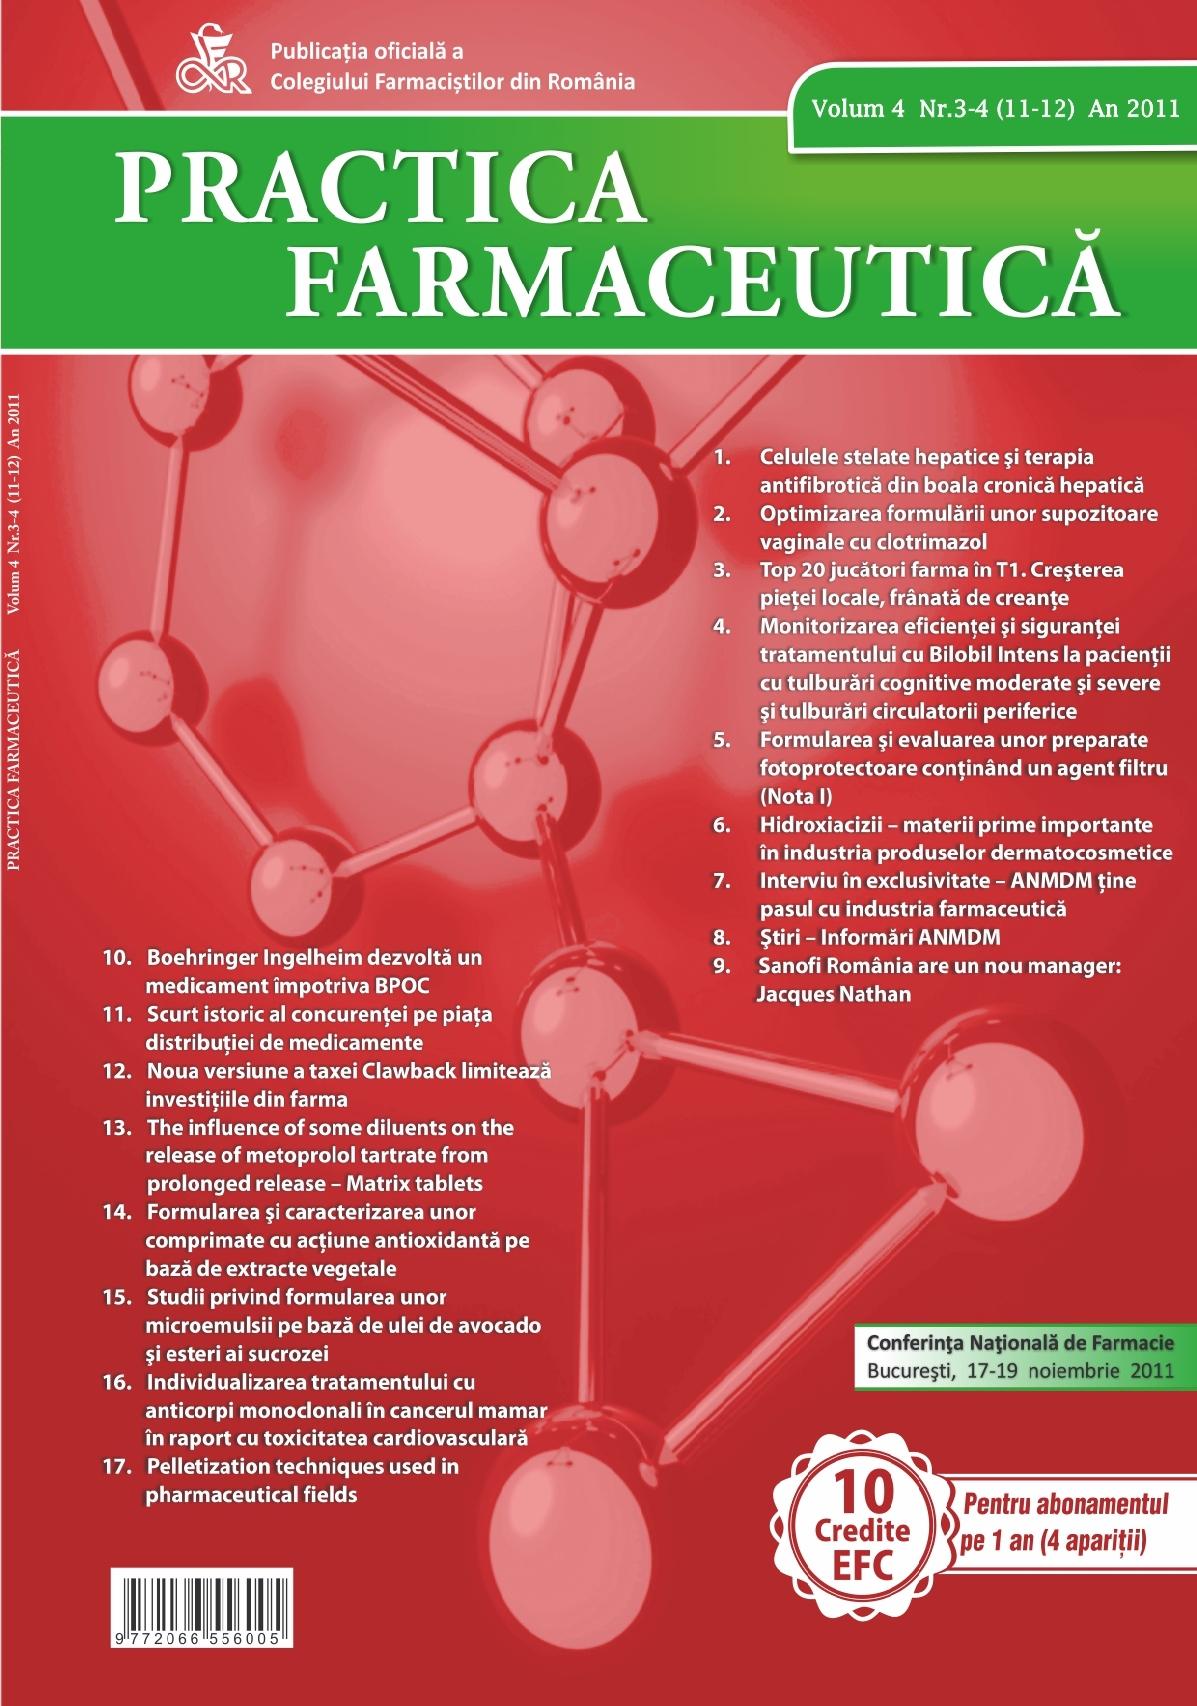 Revista Practica Farmaceutica, Vol. 4, Nr. 3-4 (11-12), 2011